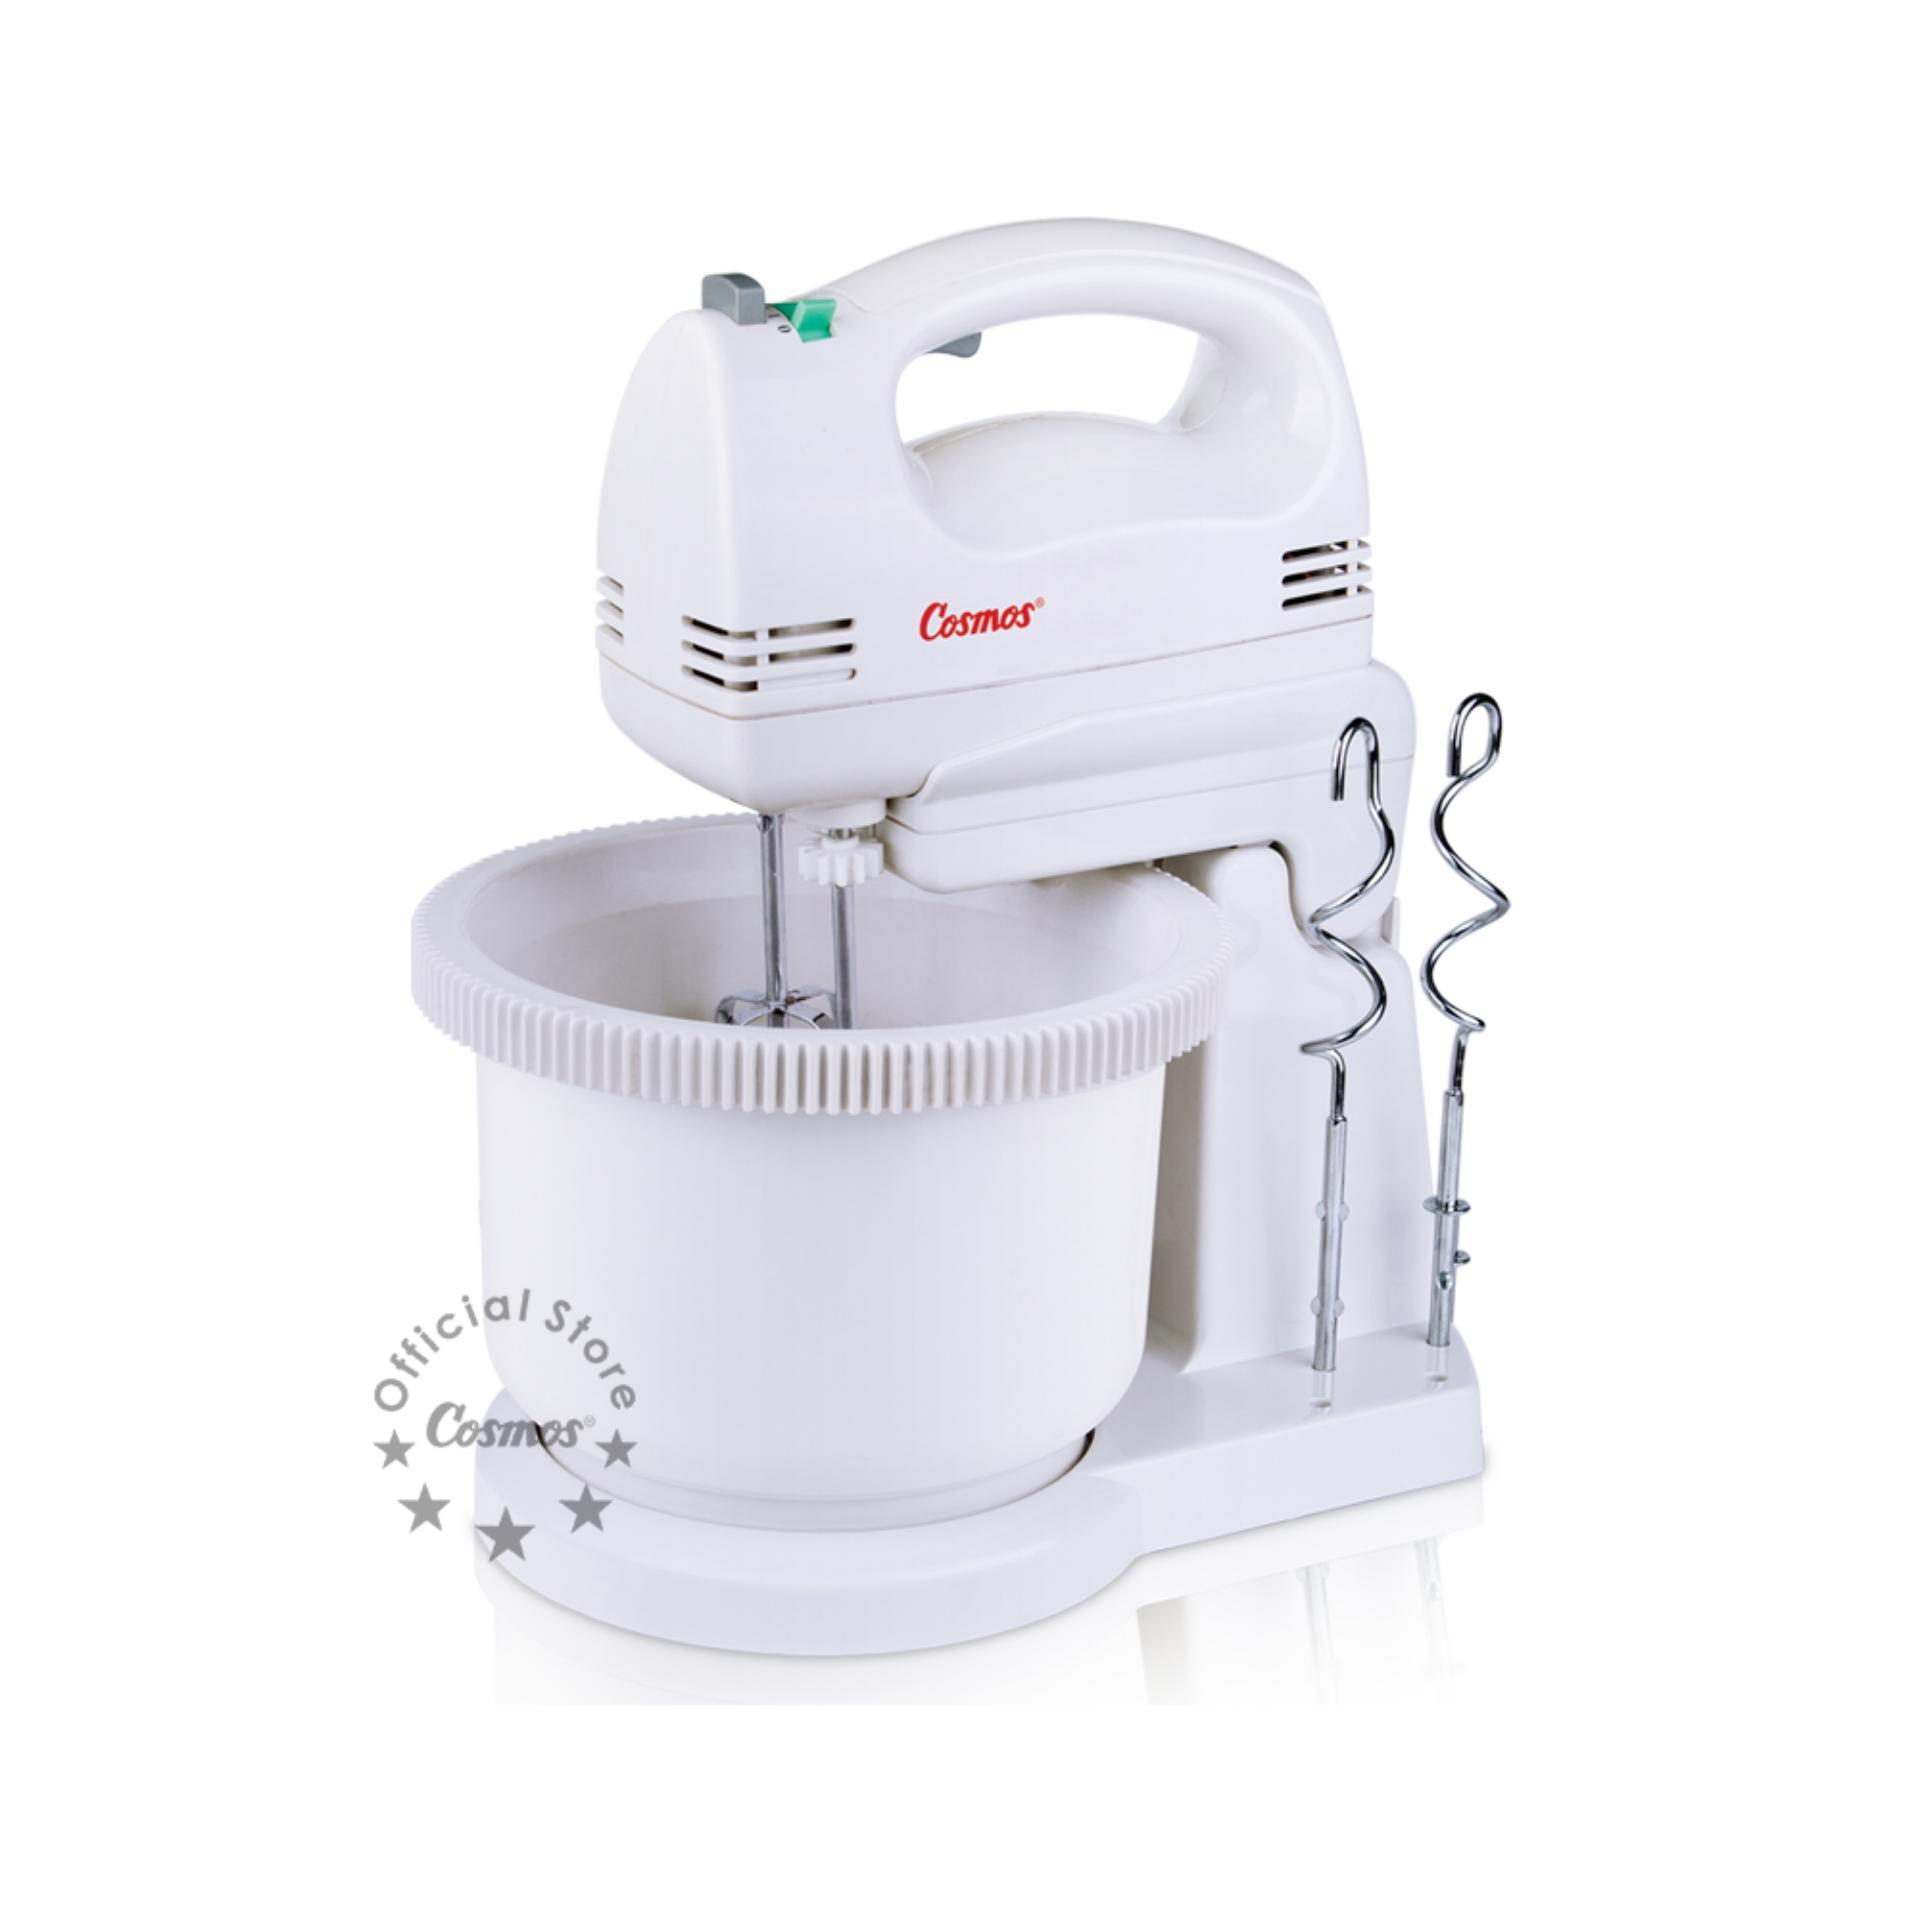 Cosmos CM-1289 - Stand Mixer